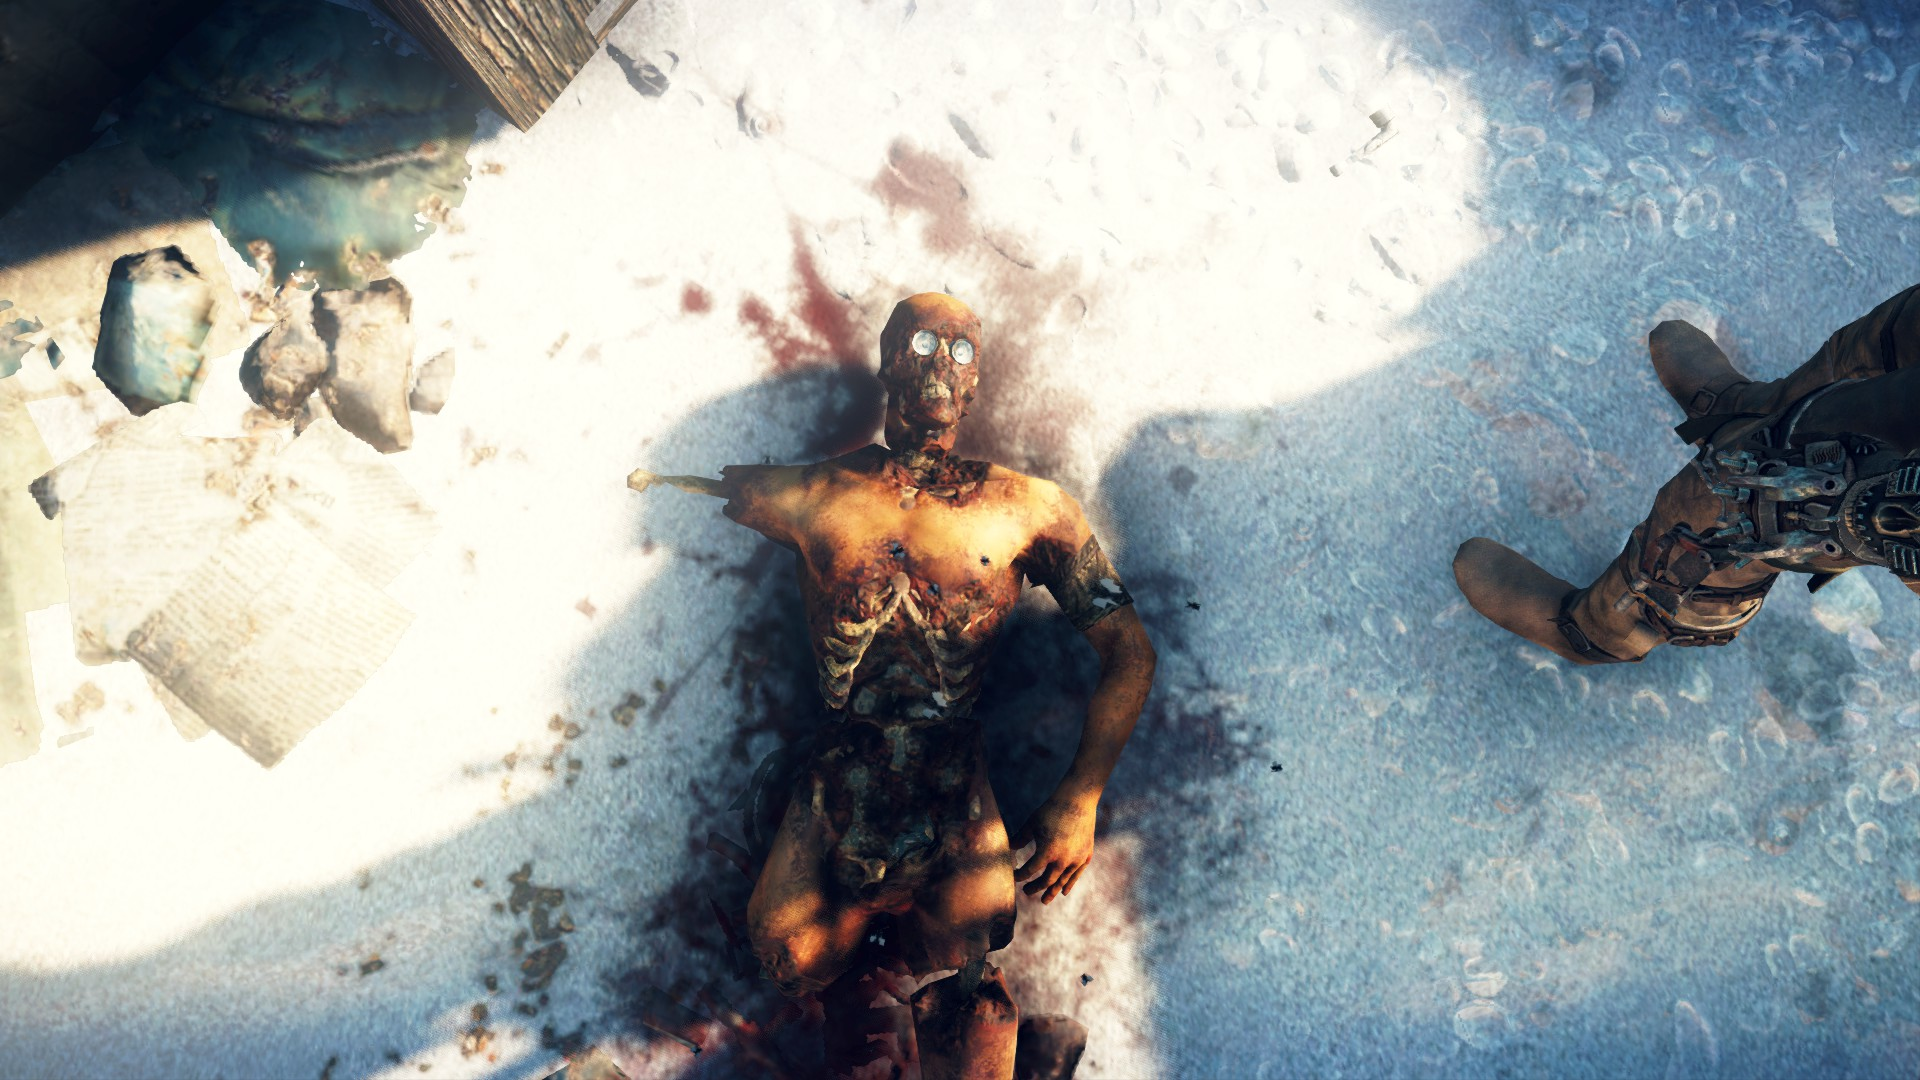 Half Life 3 Mad Max